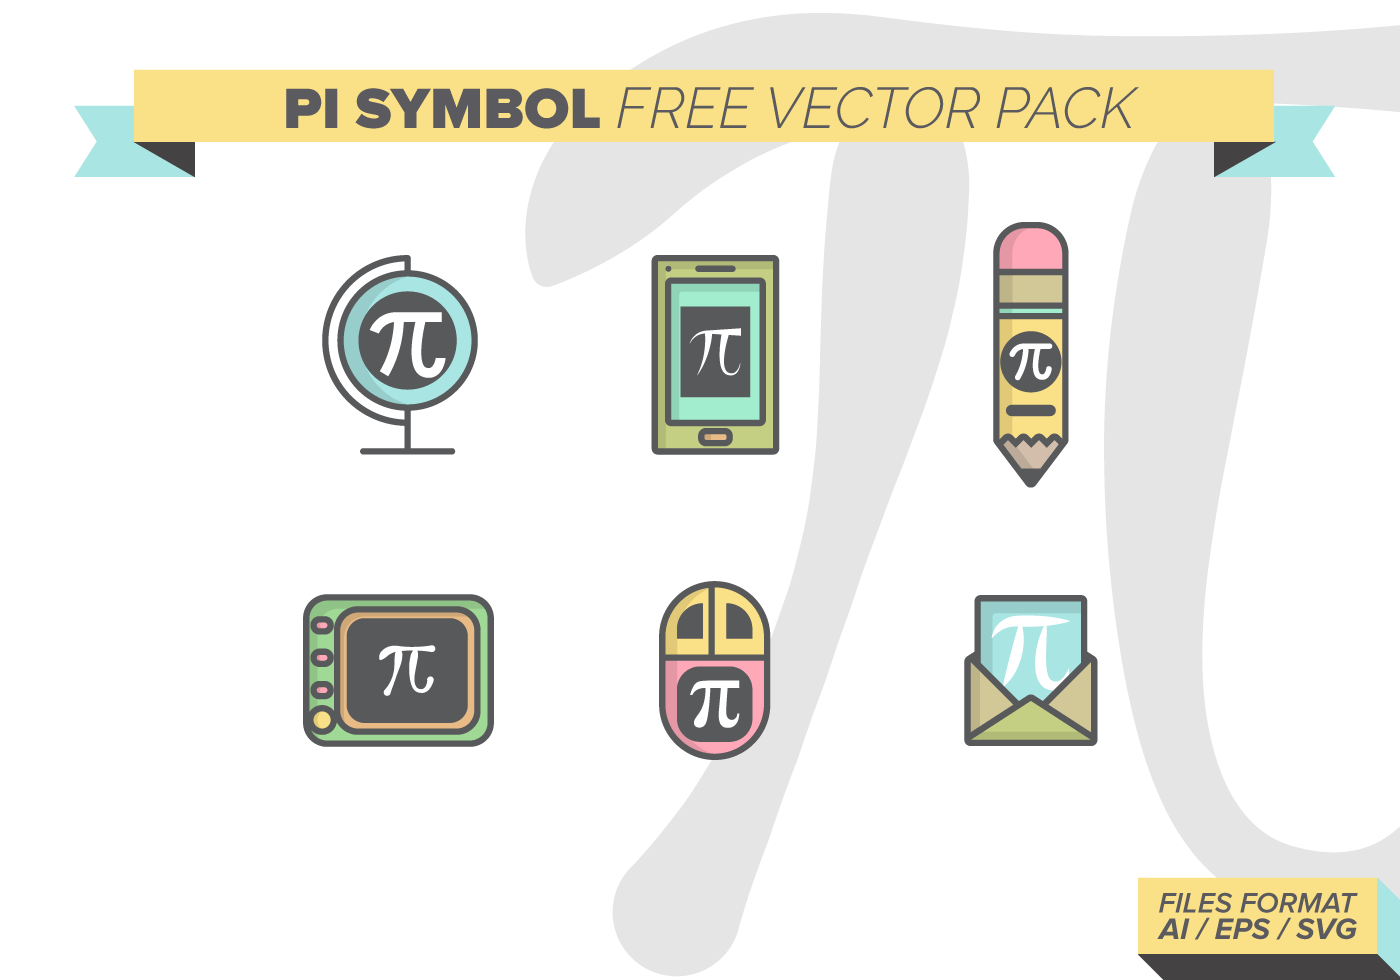 Pi symbol free vector art 30442 free downloads pi symbol free vector pack biocorpaavc